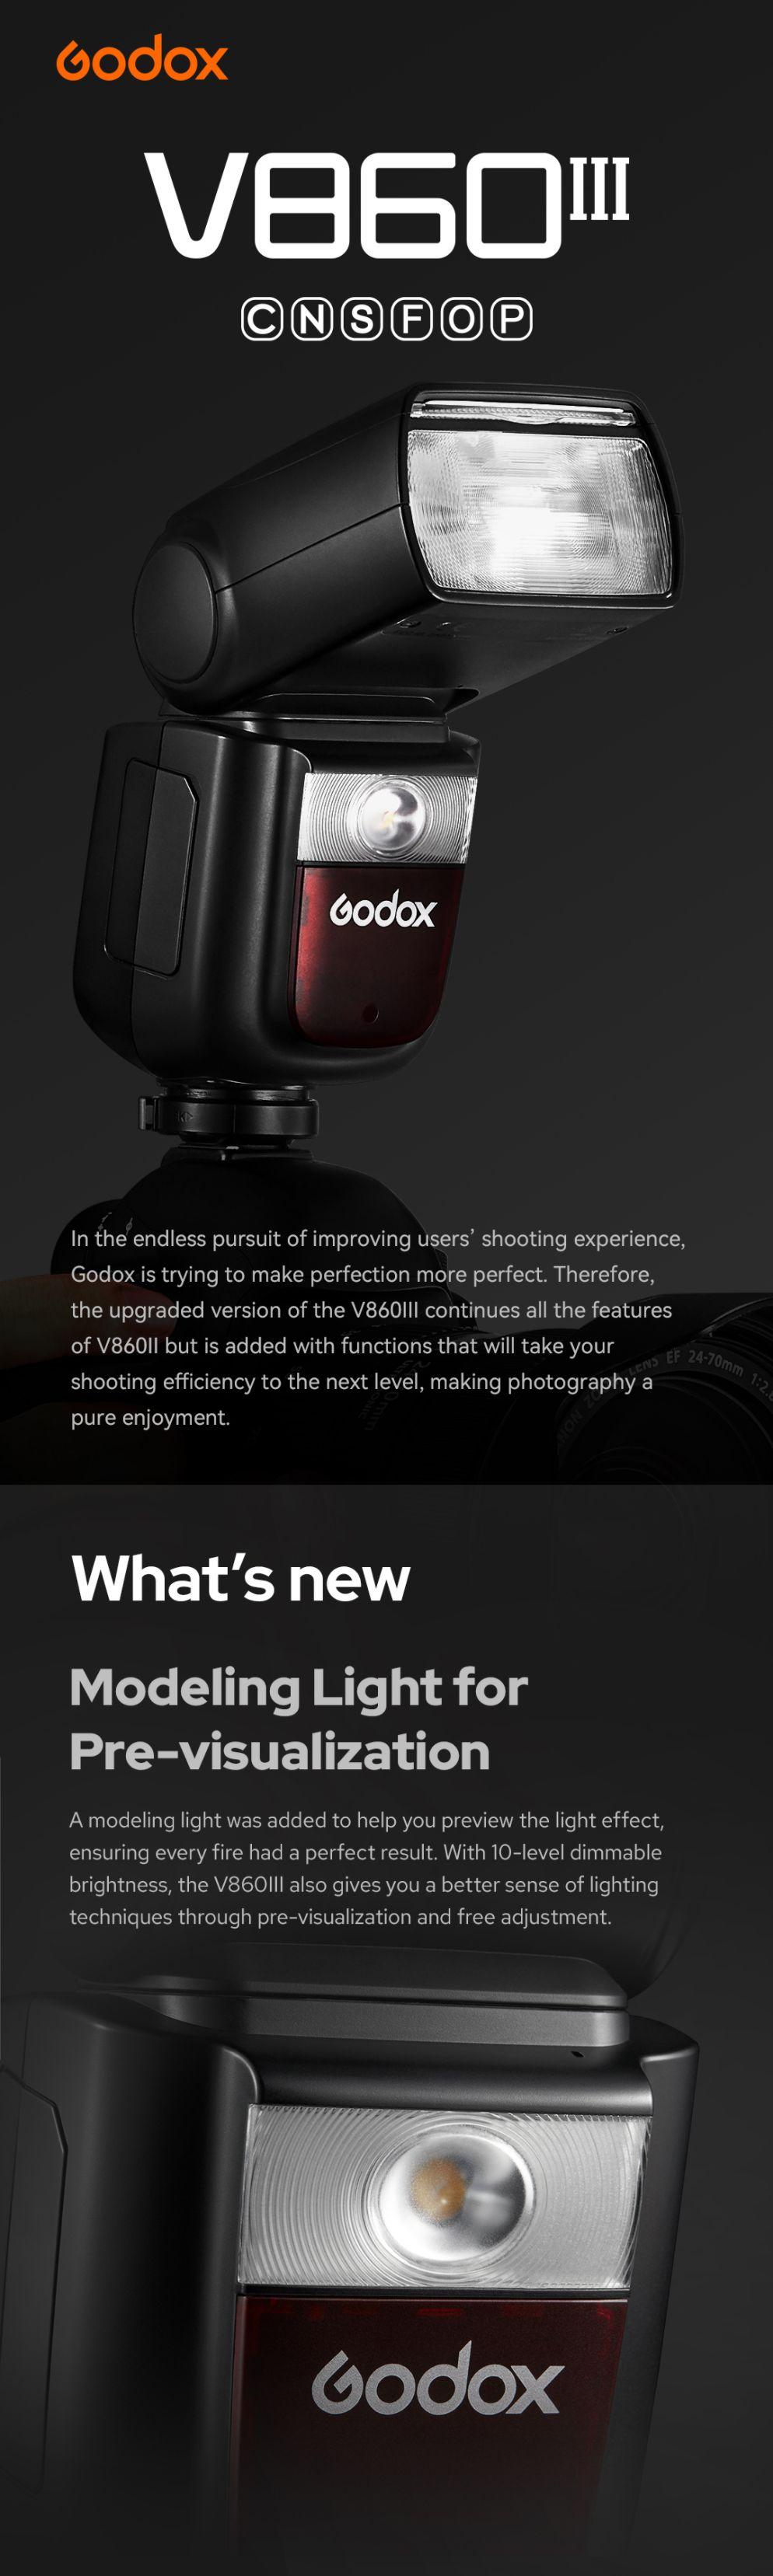 Godox V860III Canon Nikon Sony Fuji Olympus Pentax Modeling Light